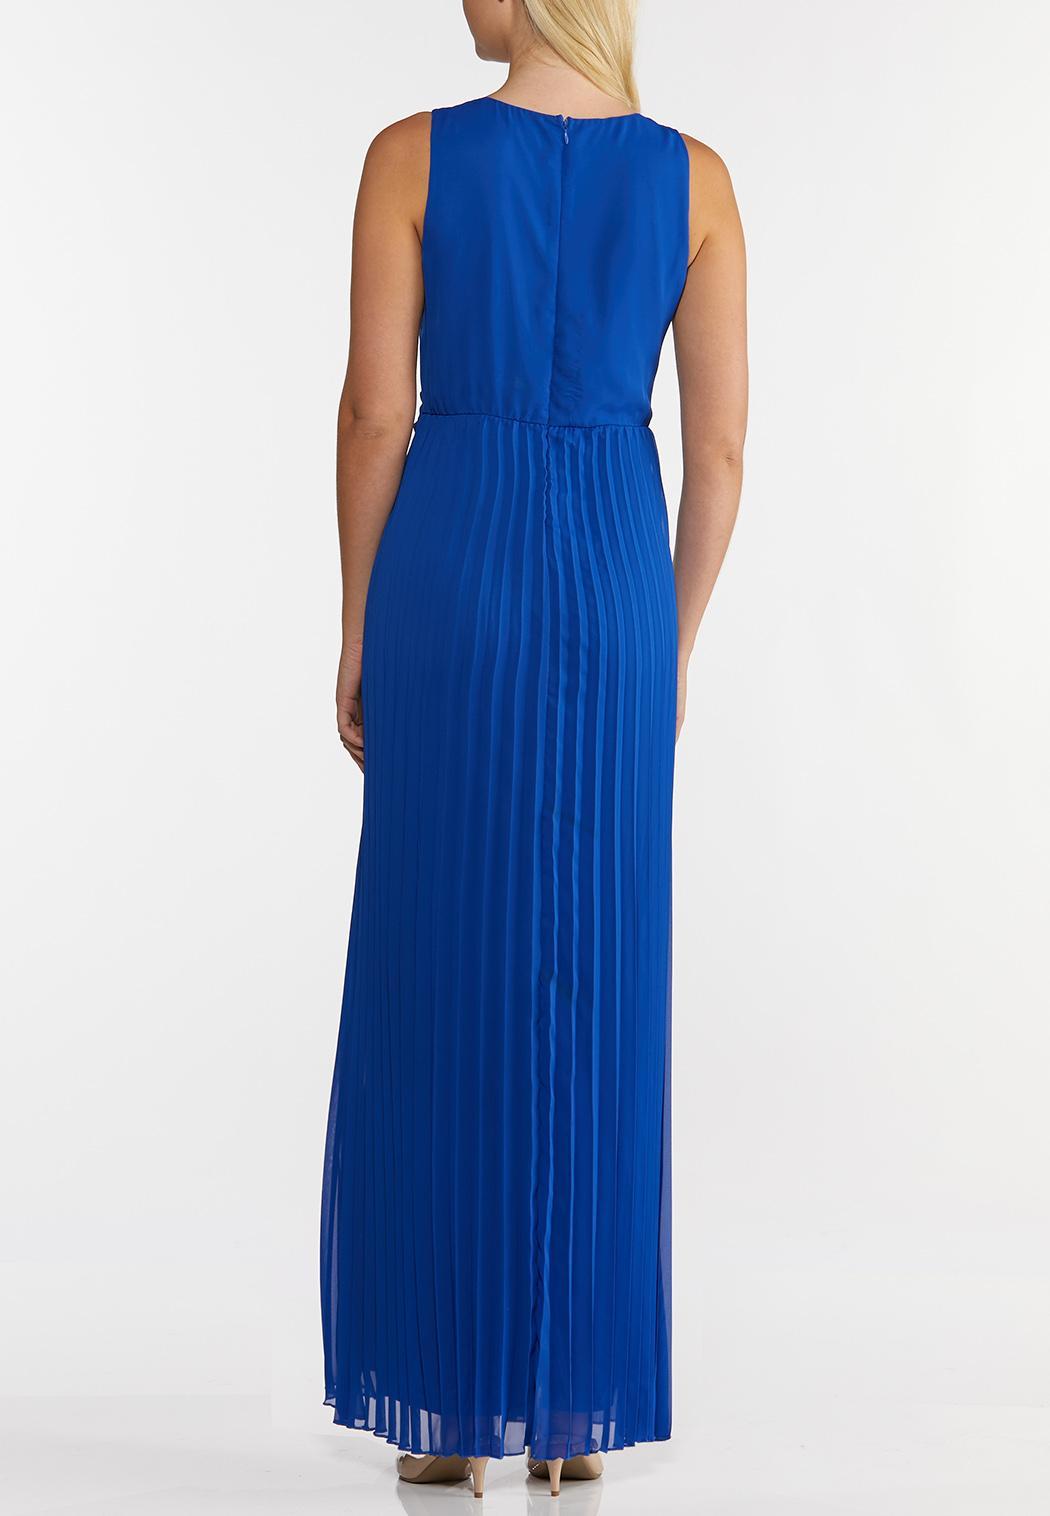 Petite Pleated Maxi Dress (Item #43715374)